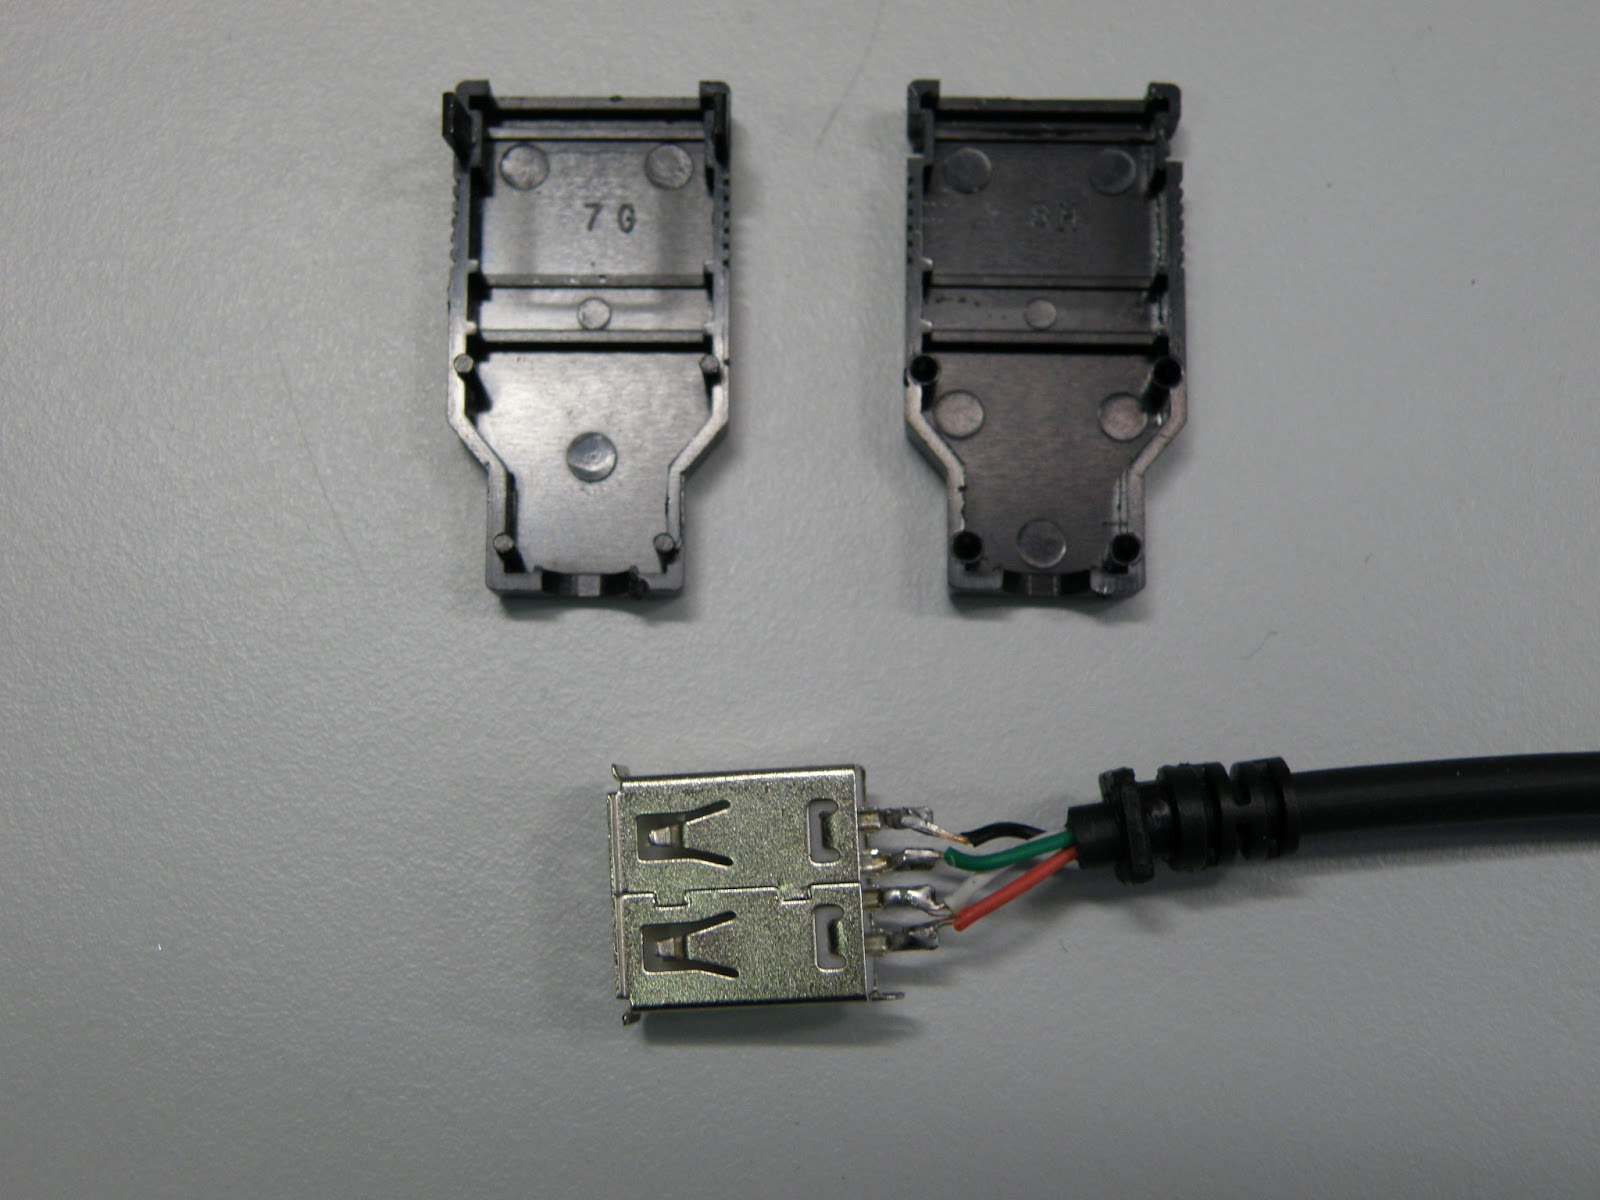 alexey s lavrov 2012 rh lexslavrov blogspot com Micro USB Wiring -Diagram USB Connection Wiring Diagram